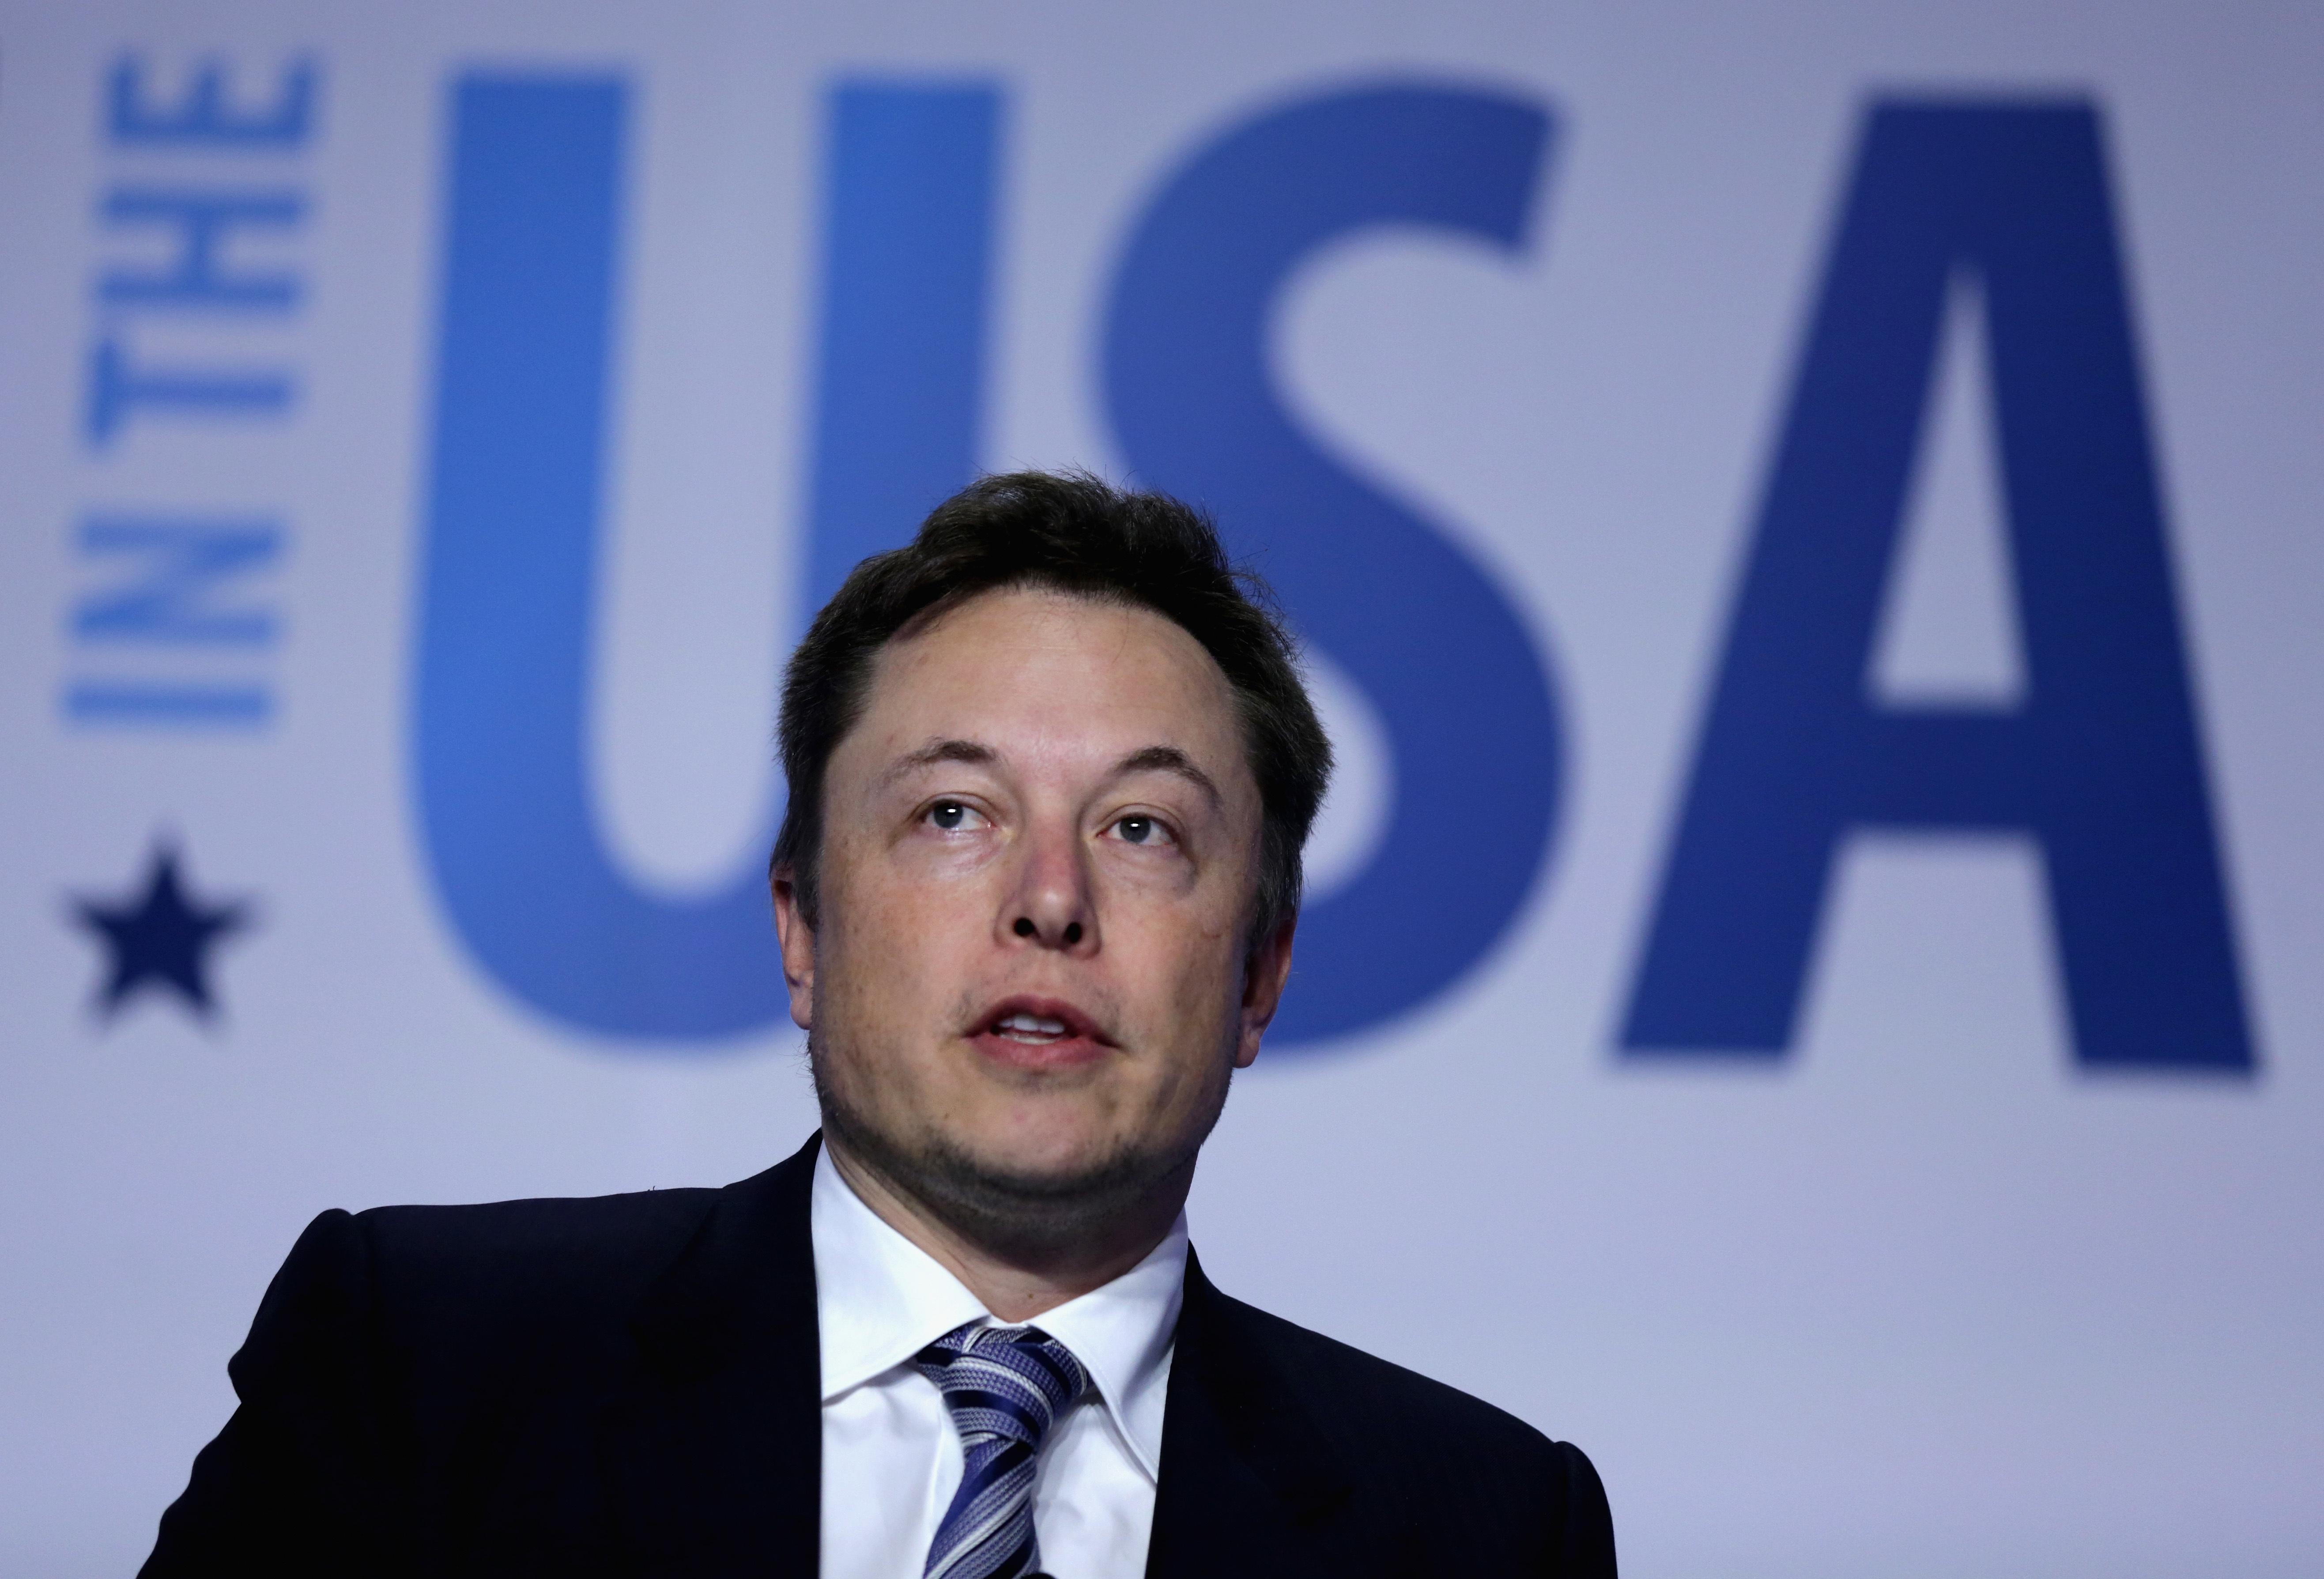 Elon Musk Denies SpaceX's Donald Trump Campaign Donation | Inverse